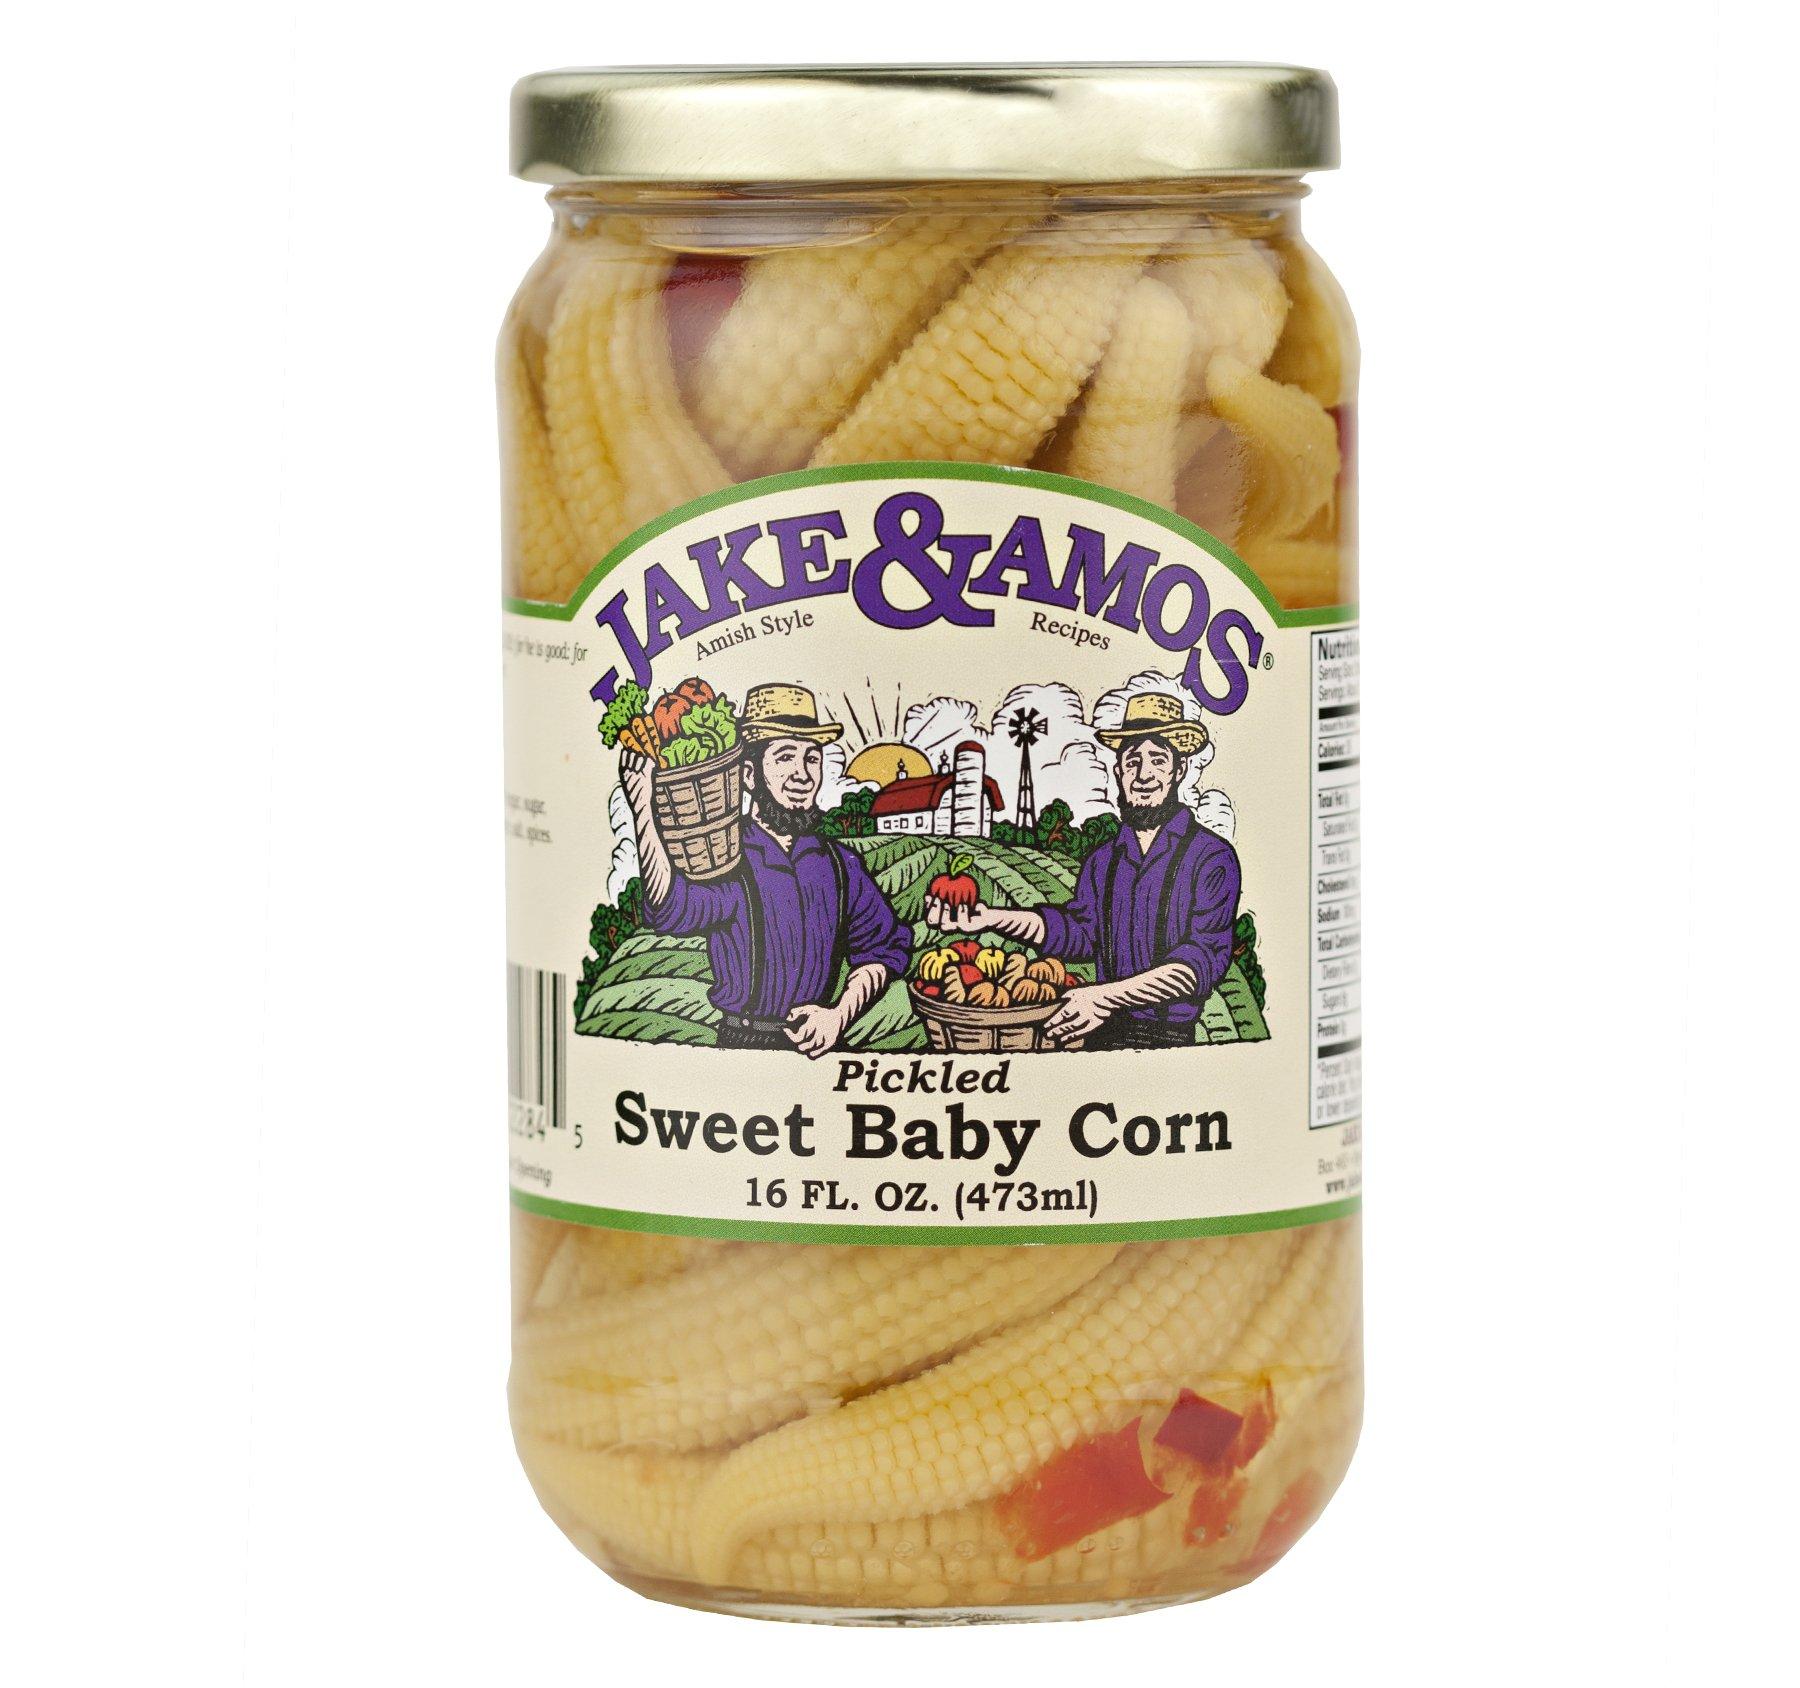 Jake & Amos Pickled Sweet Baby Corn 16 oz. (3 Jars)